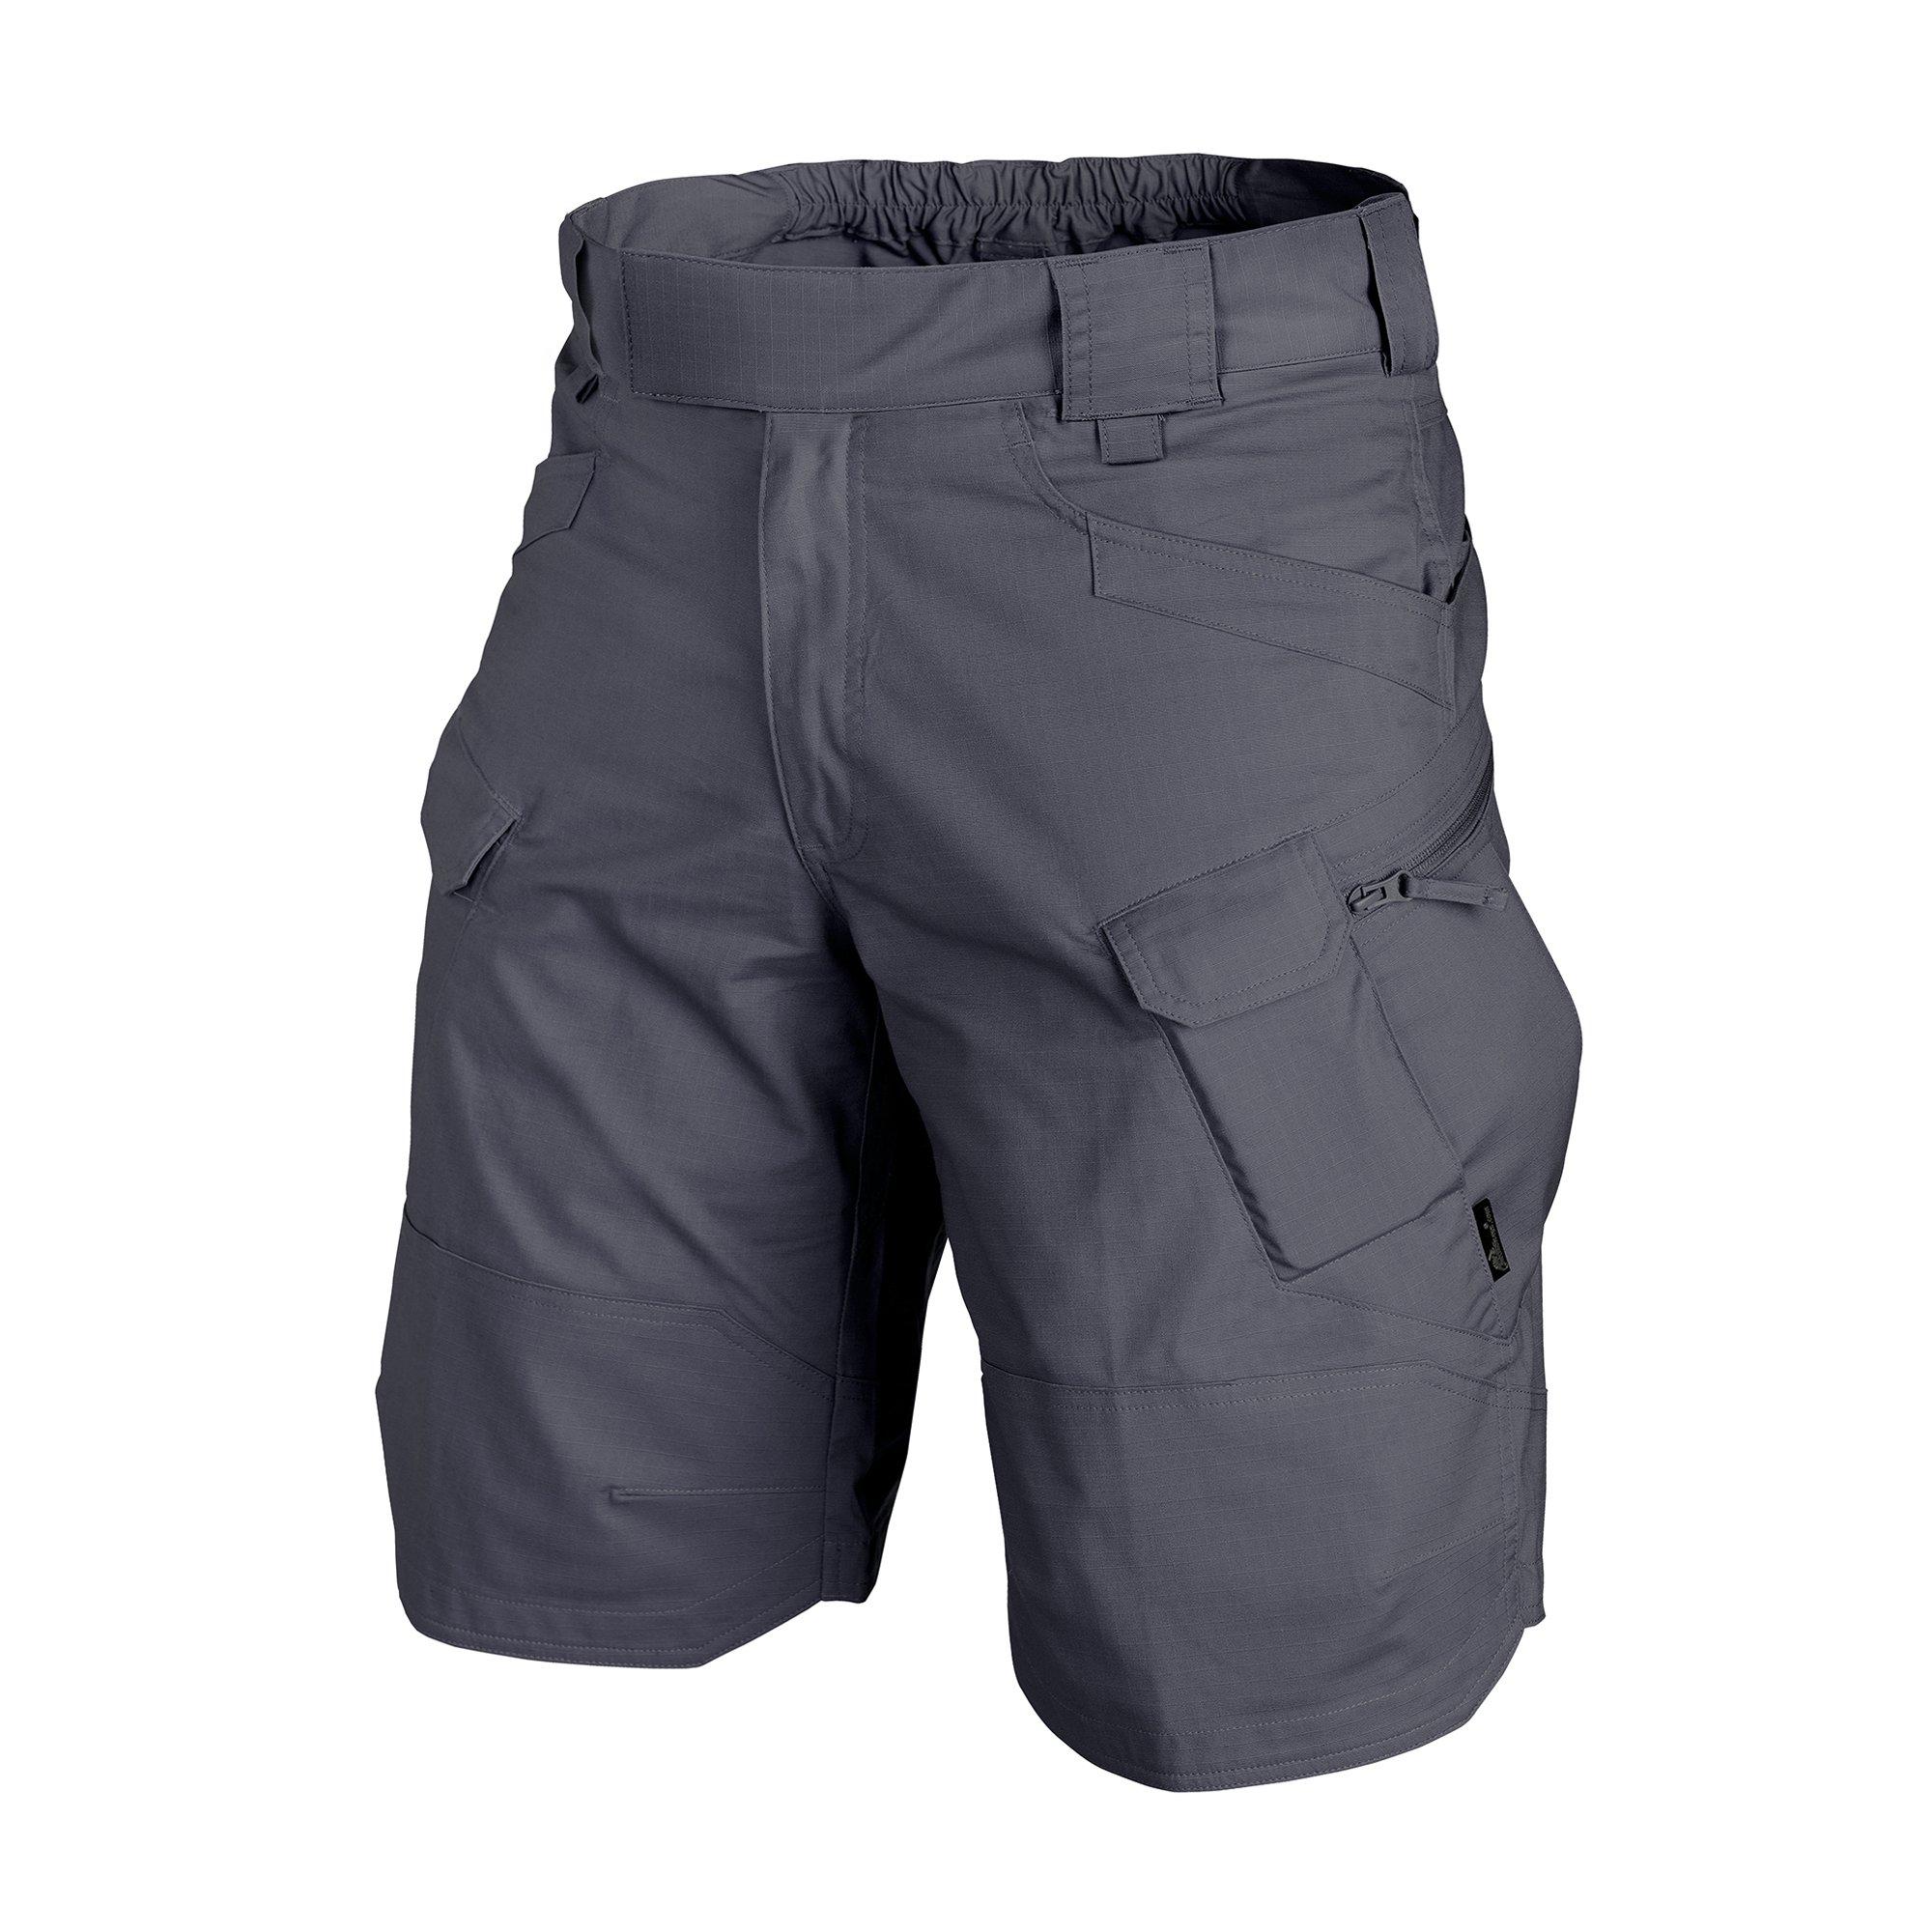 HELIKON-TEX Urban Line, UTS Urban Tactical Shorts 11'' Polycotton Ripstop Shadow Grey Waist 38